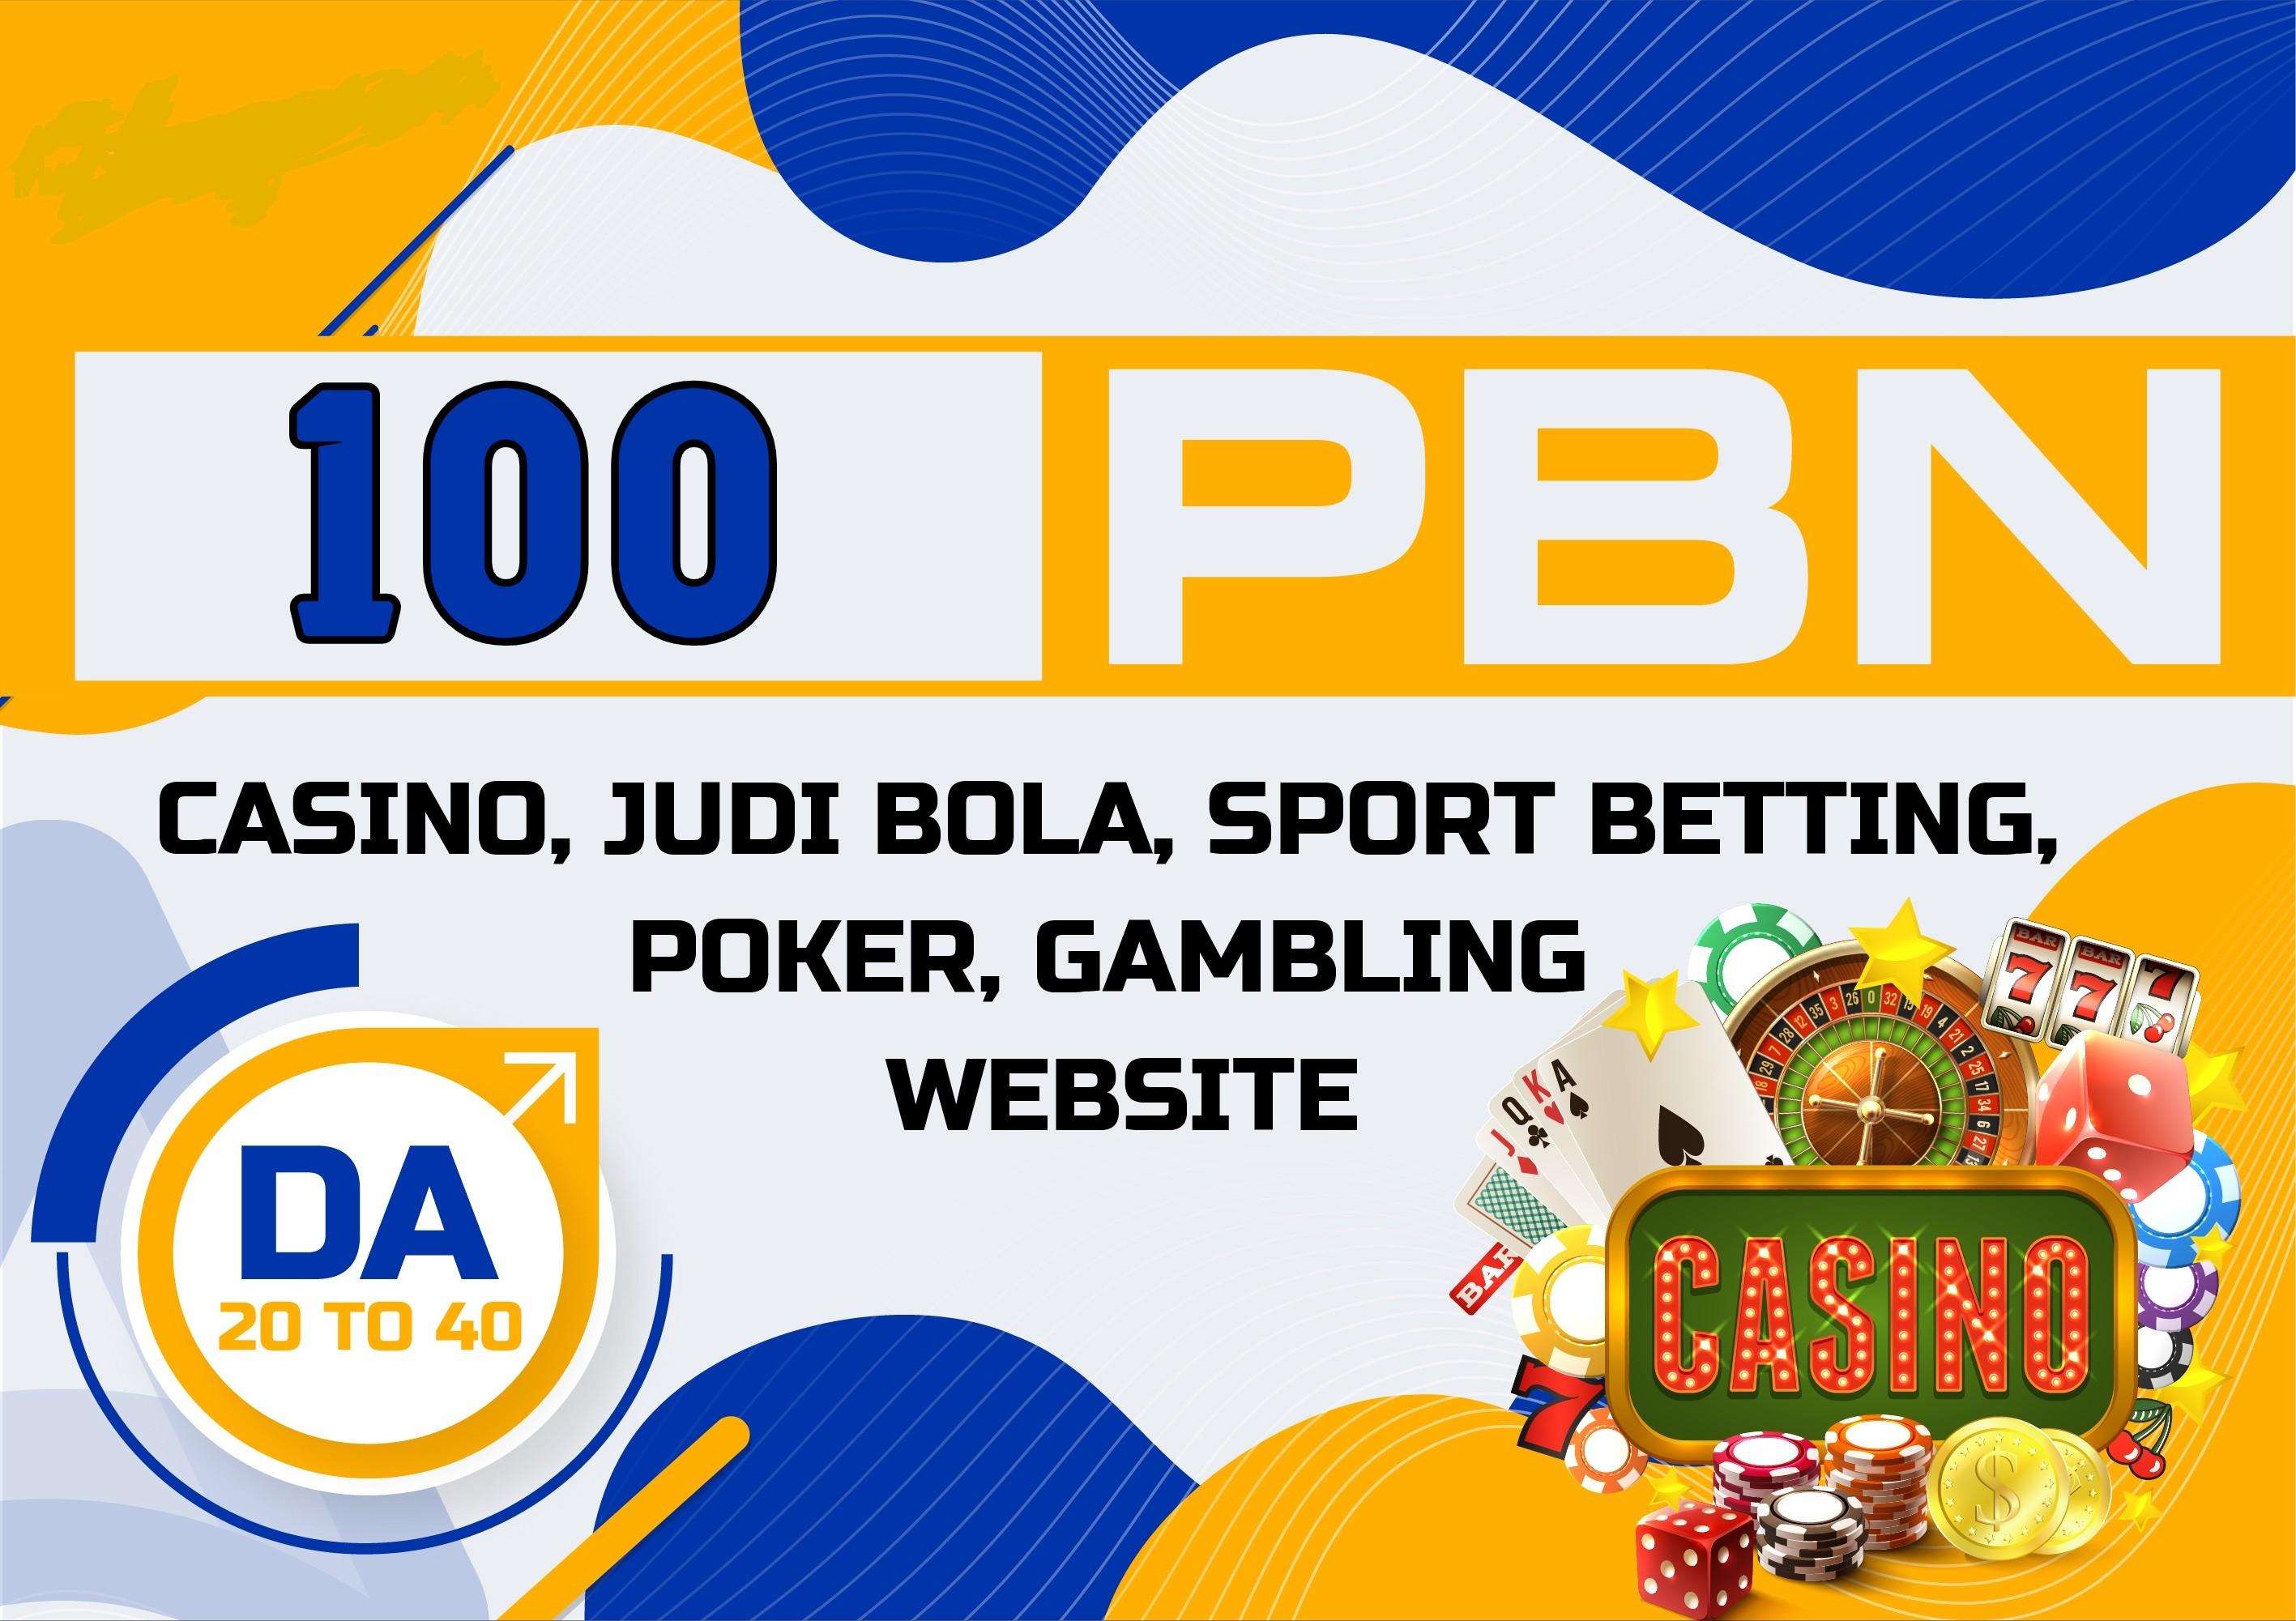 100 HomePage PBN'S Casino Sport Betting UFABET Website Dofollow Backlinks's PA 20+